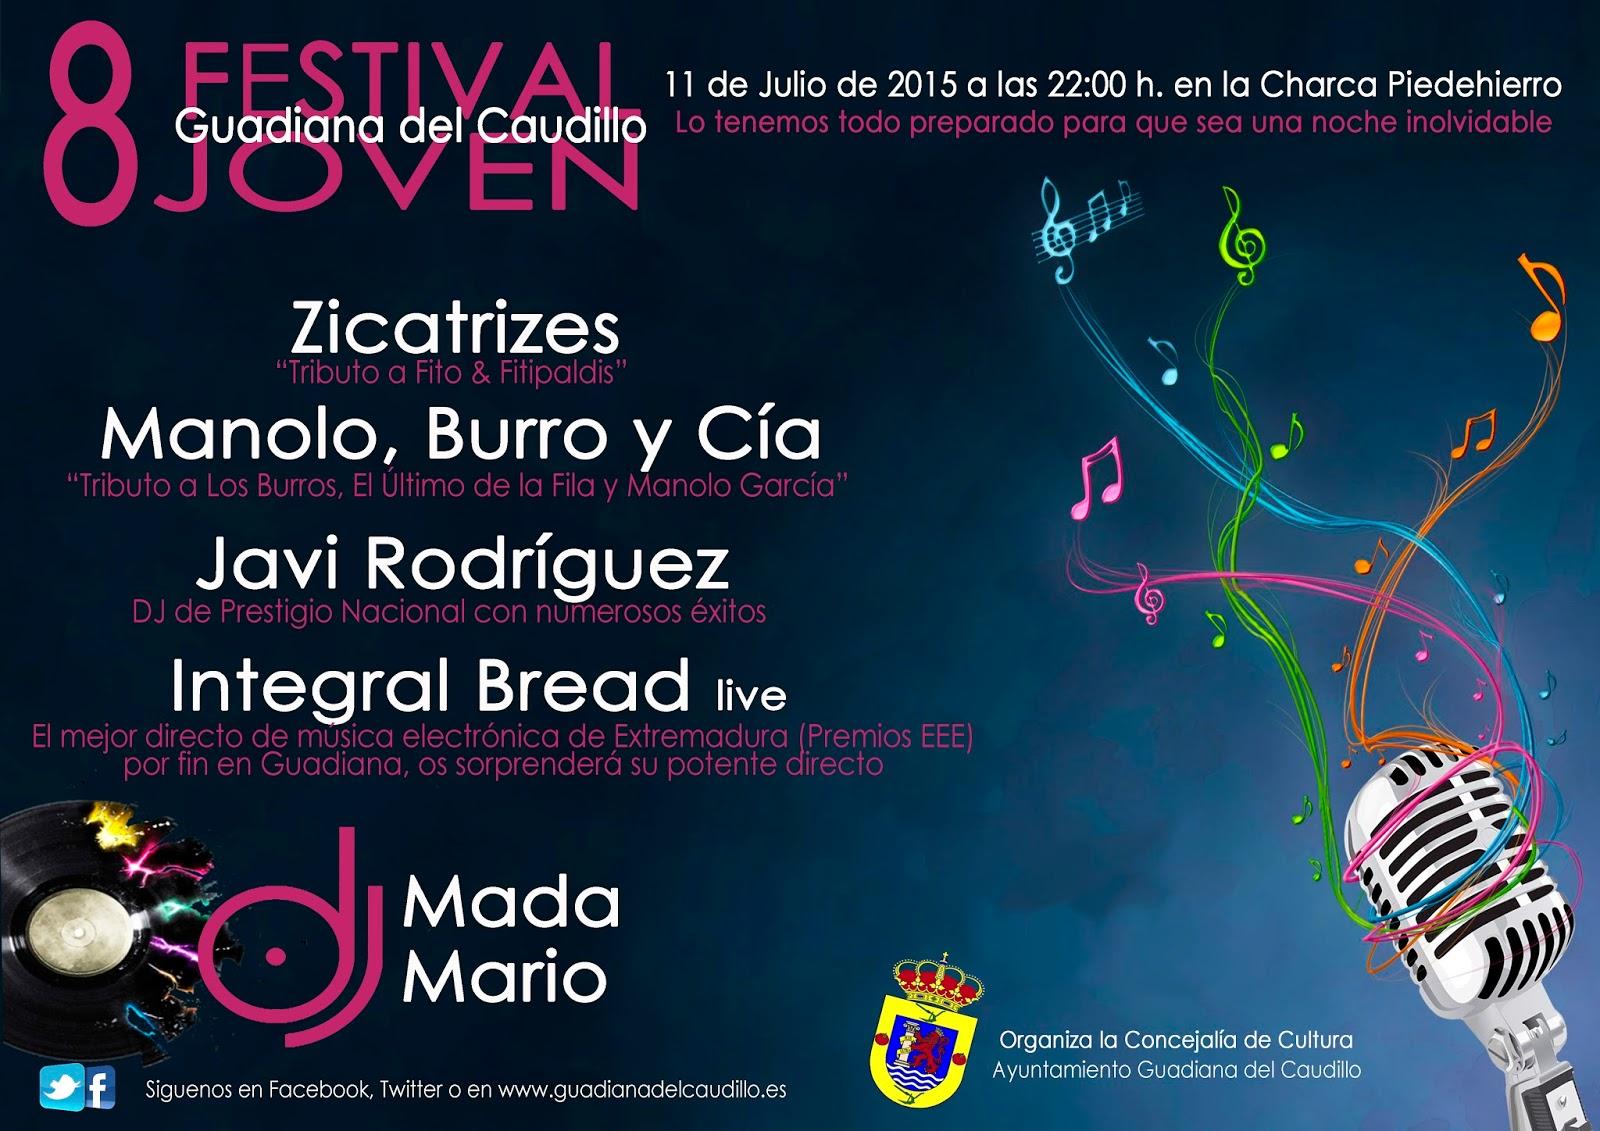 8 Festival Joven